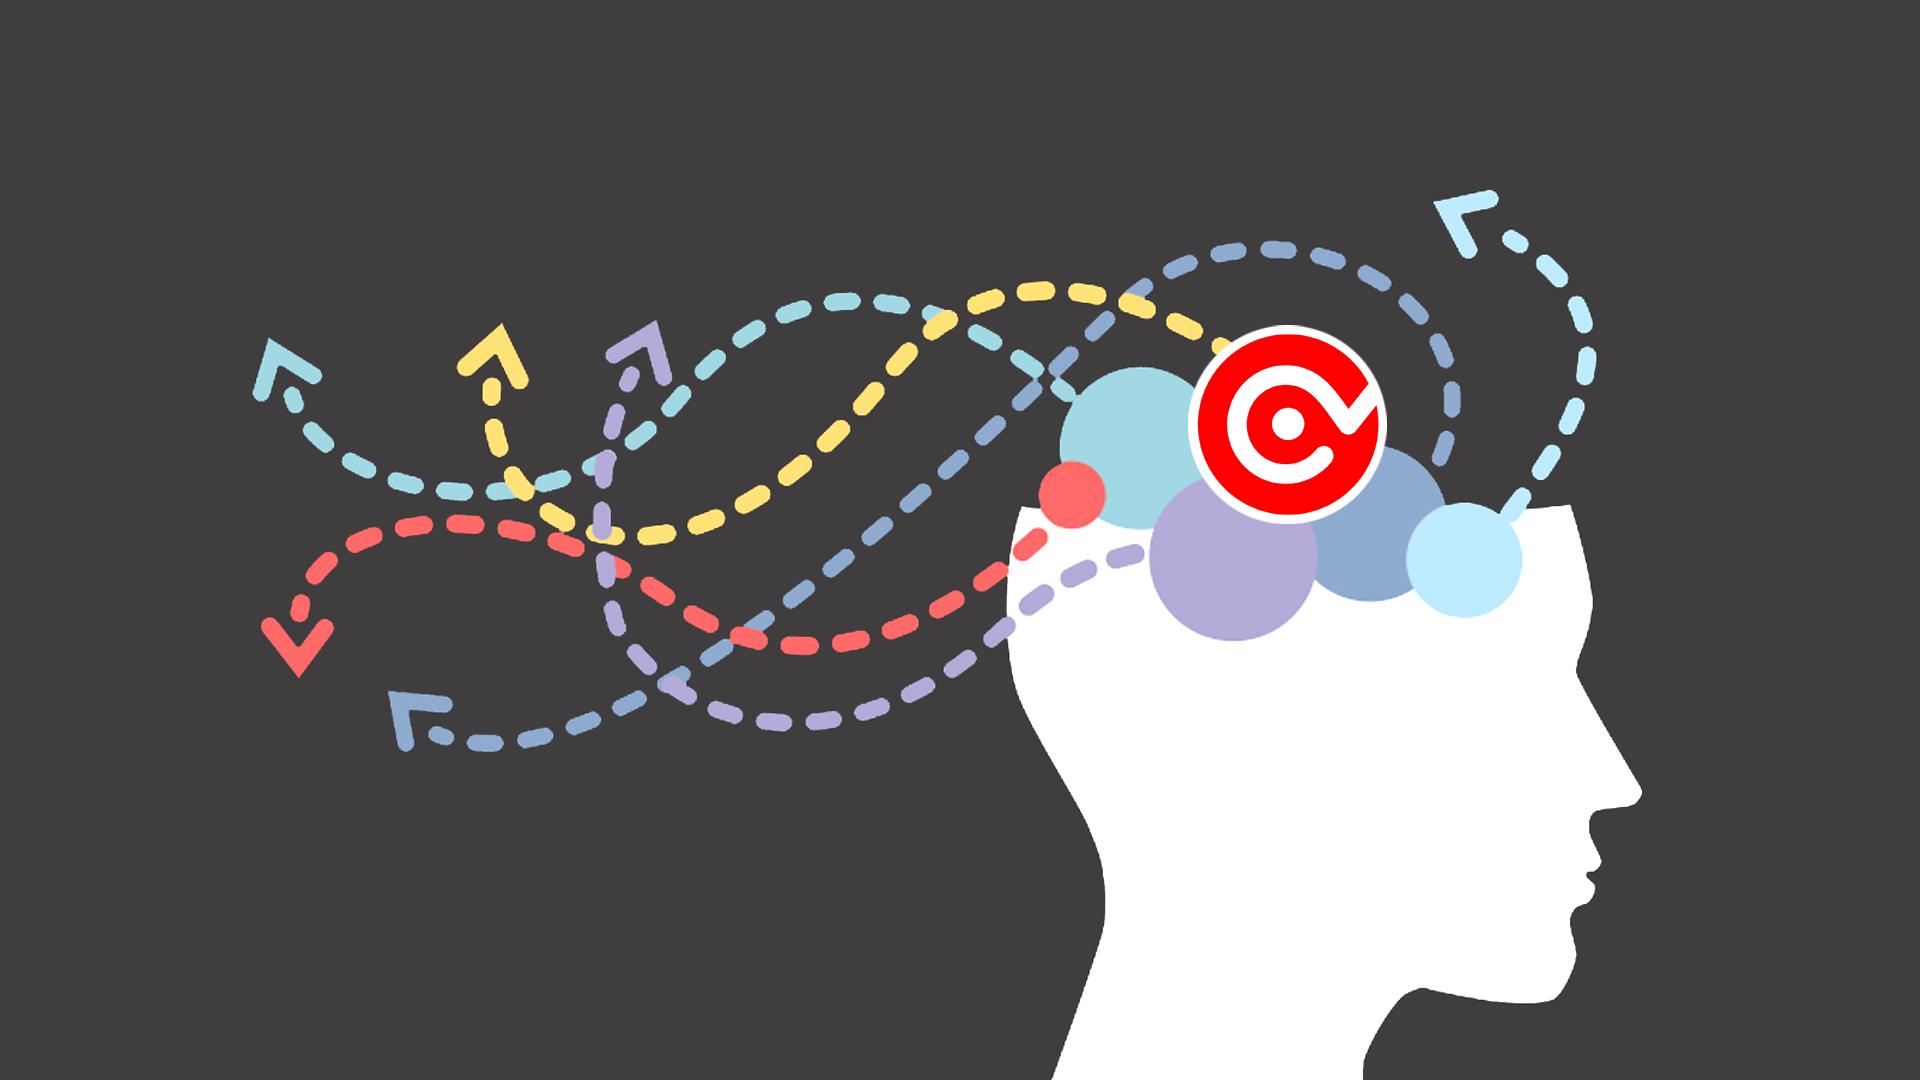 behavioural-science-advertising-credis-visca-mind